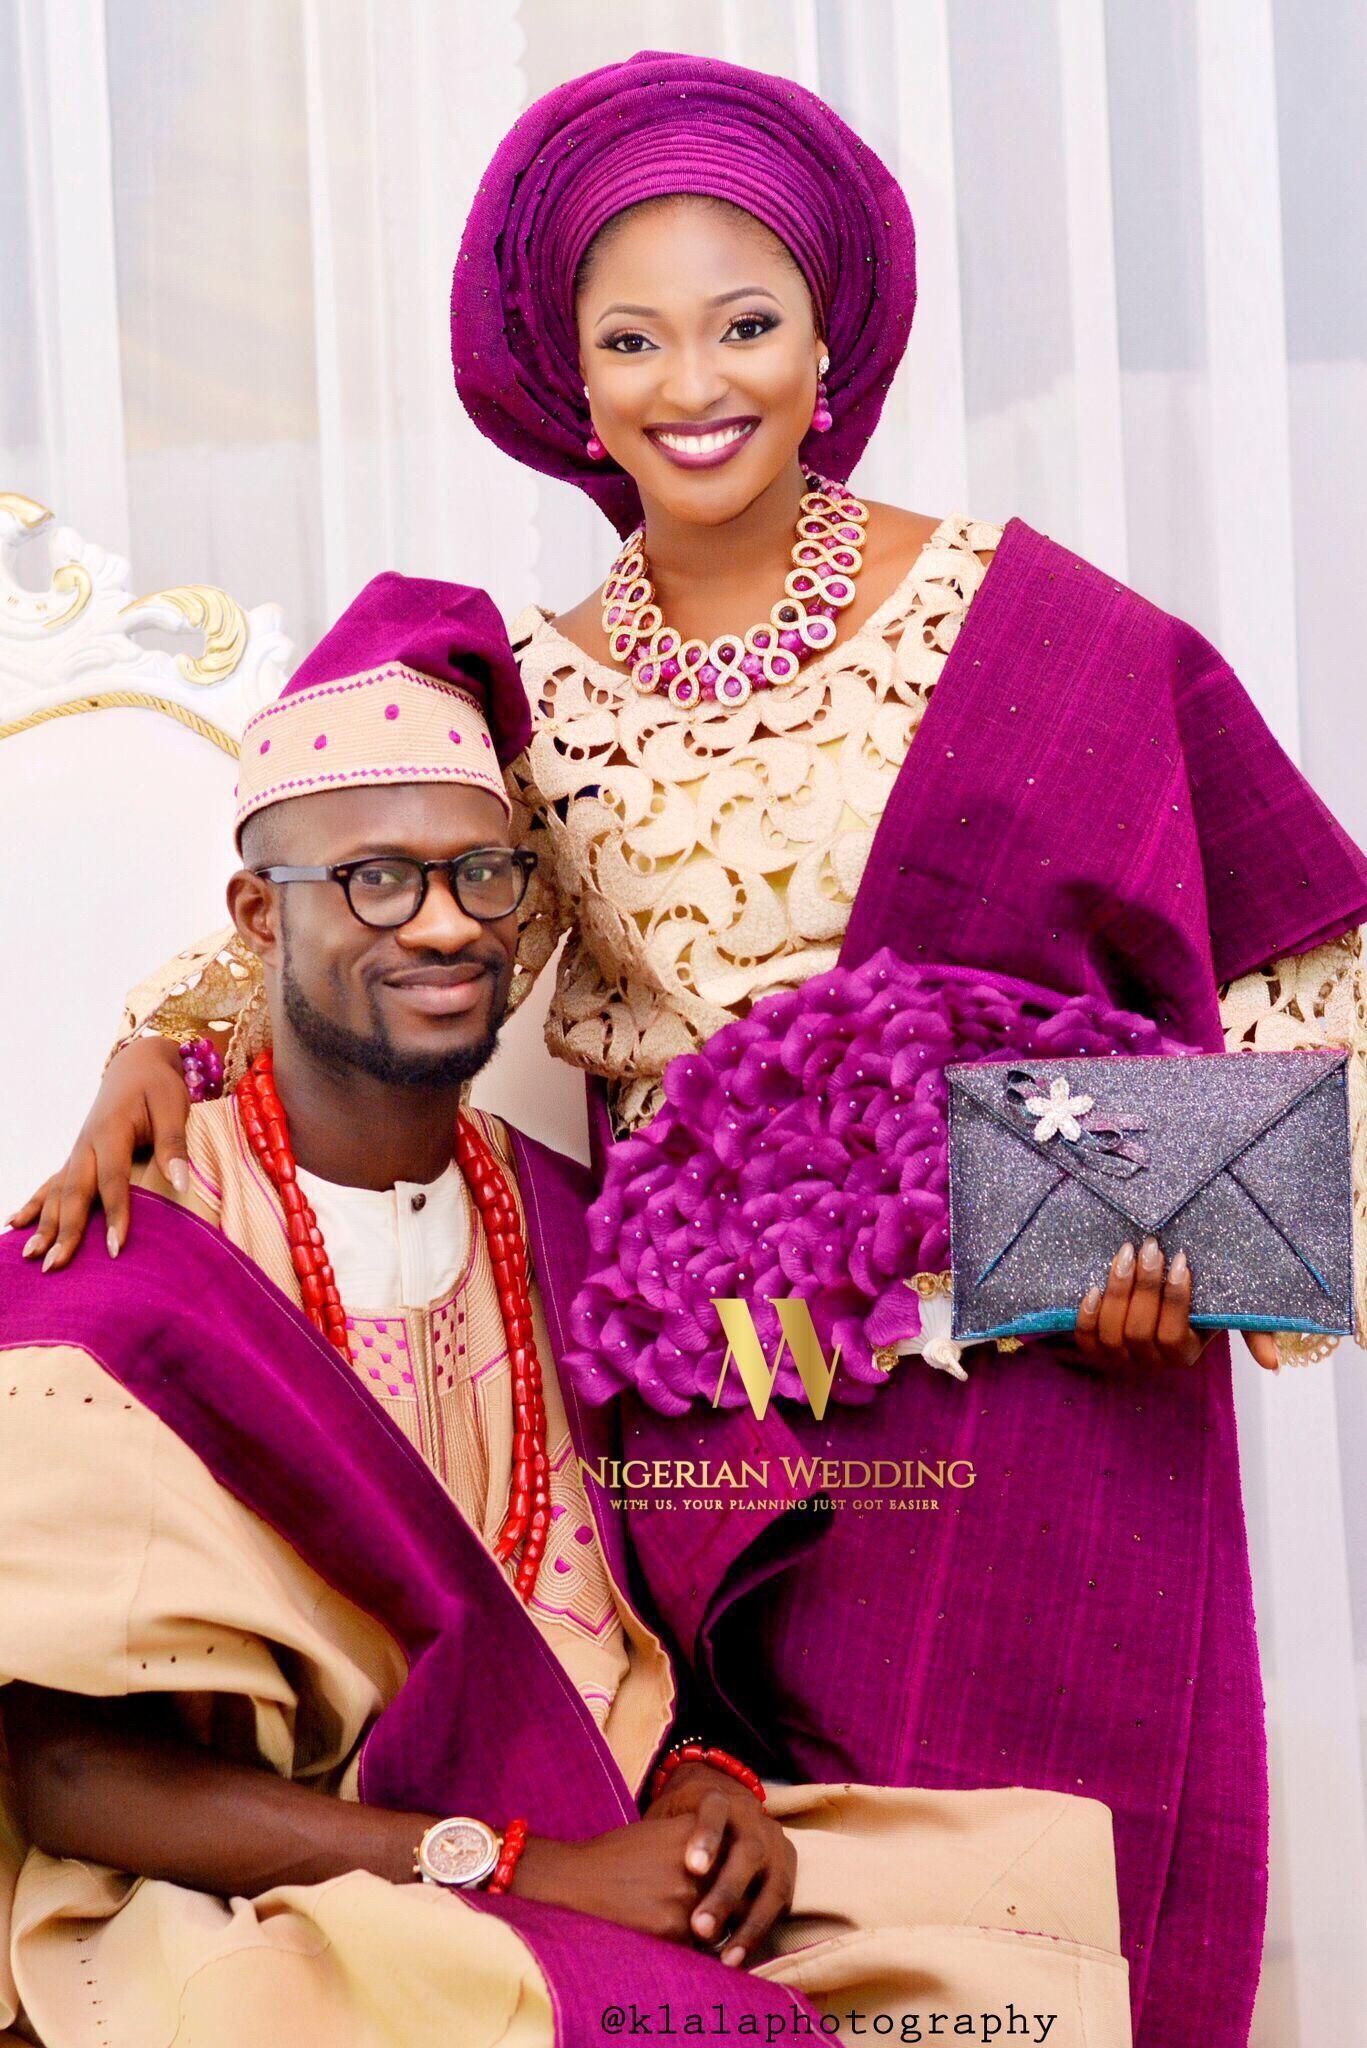 Nigerian wedding presents the stunningly colourful wedding ceremony